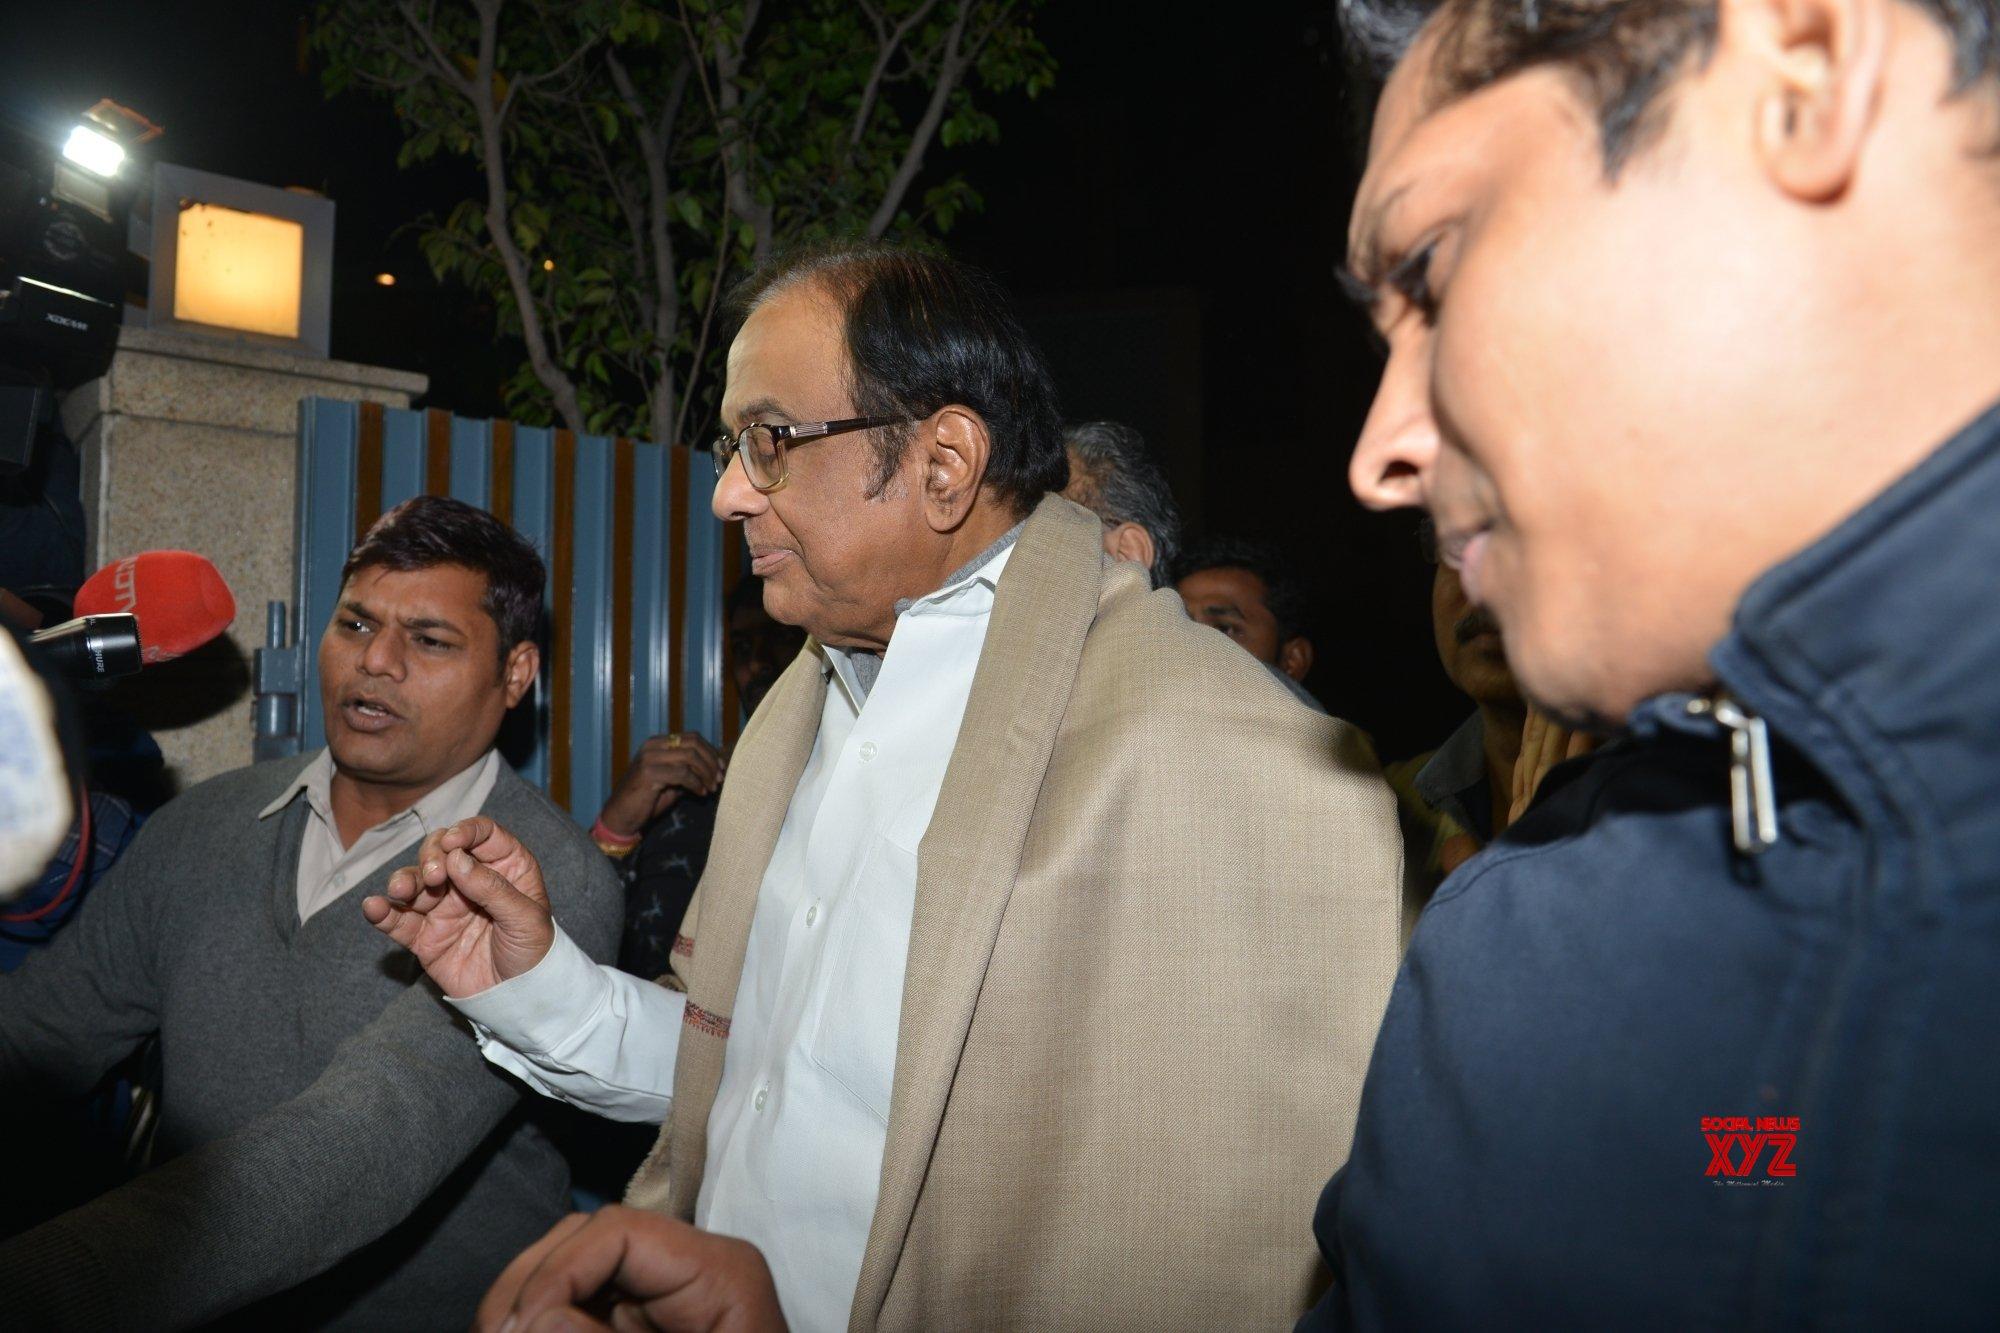 New Delhi: P Chidambaram walks out of Tihar jail #Gallery